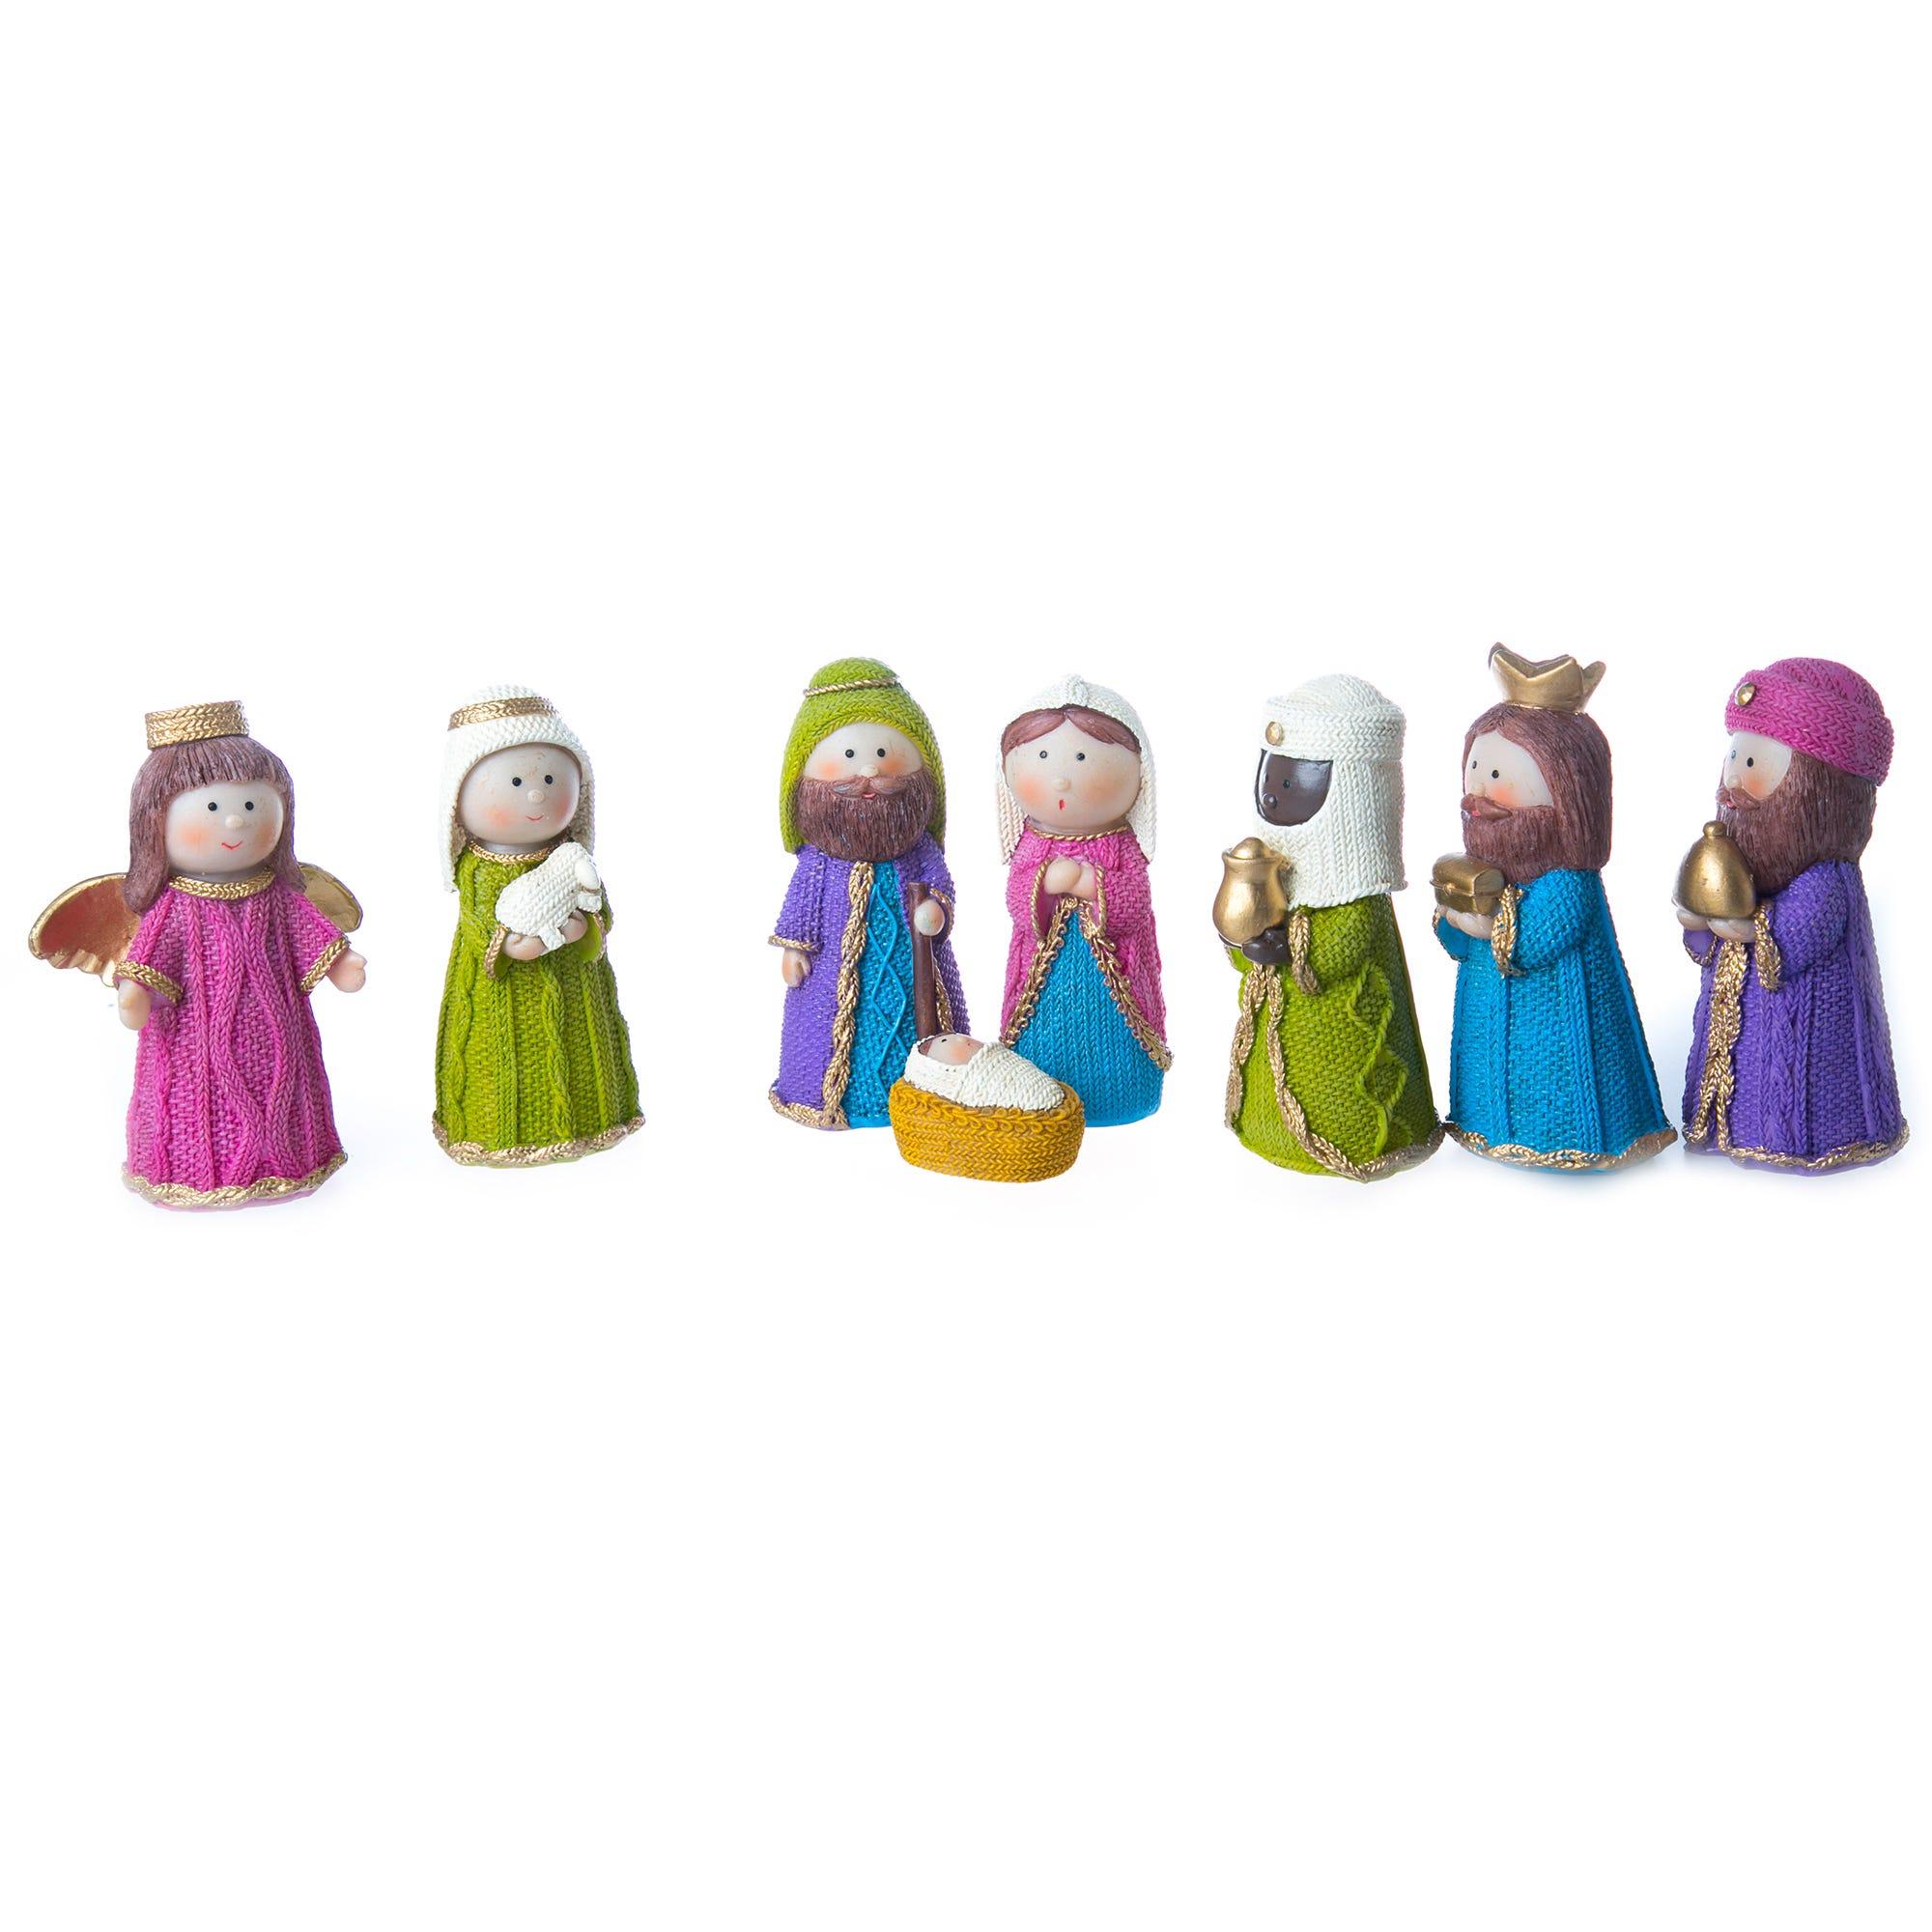 Nacimiento navideño, 8 piezas